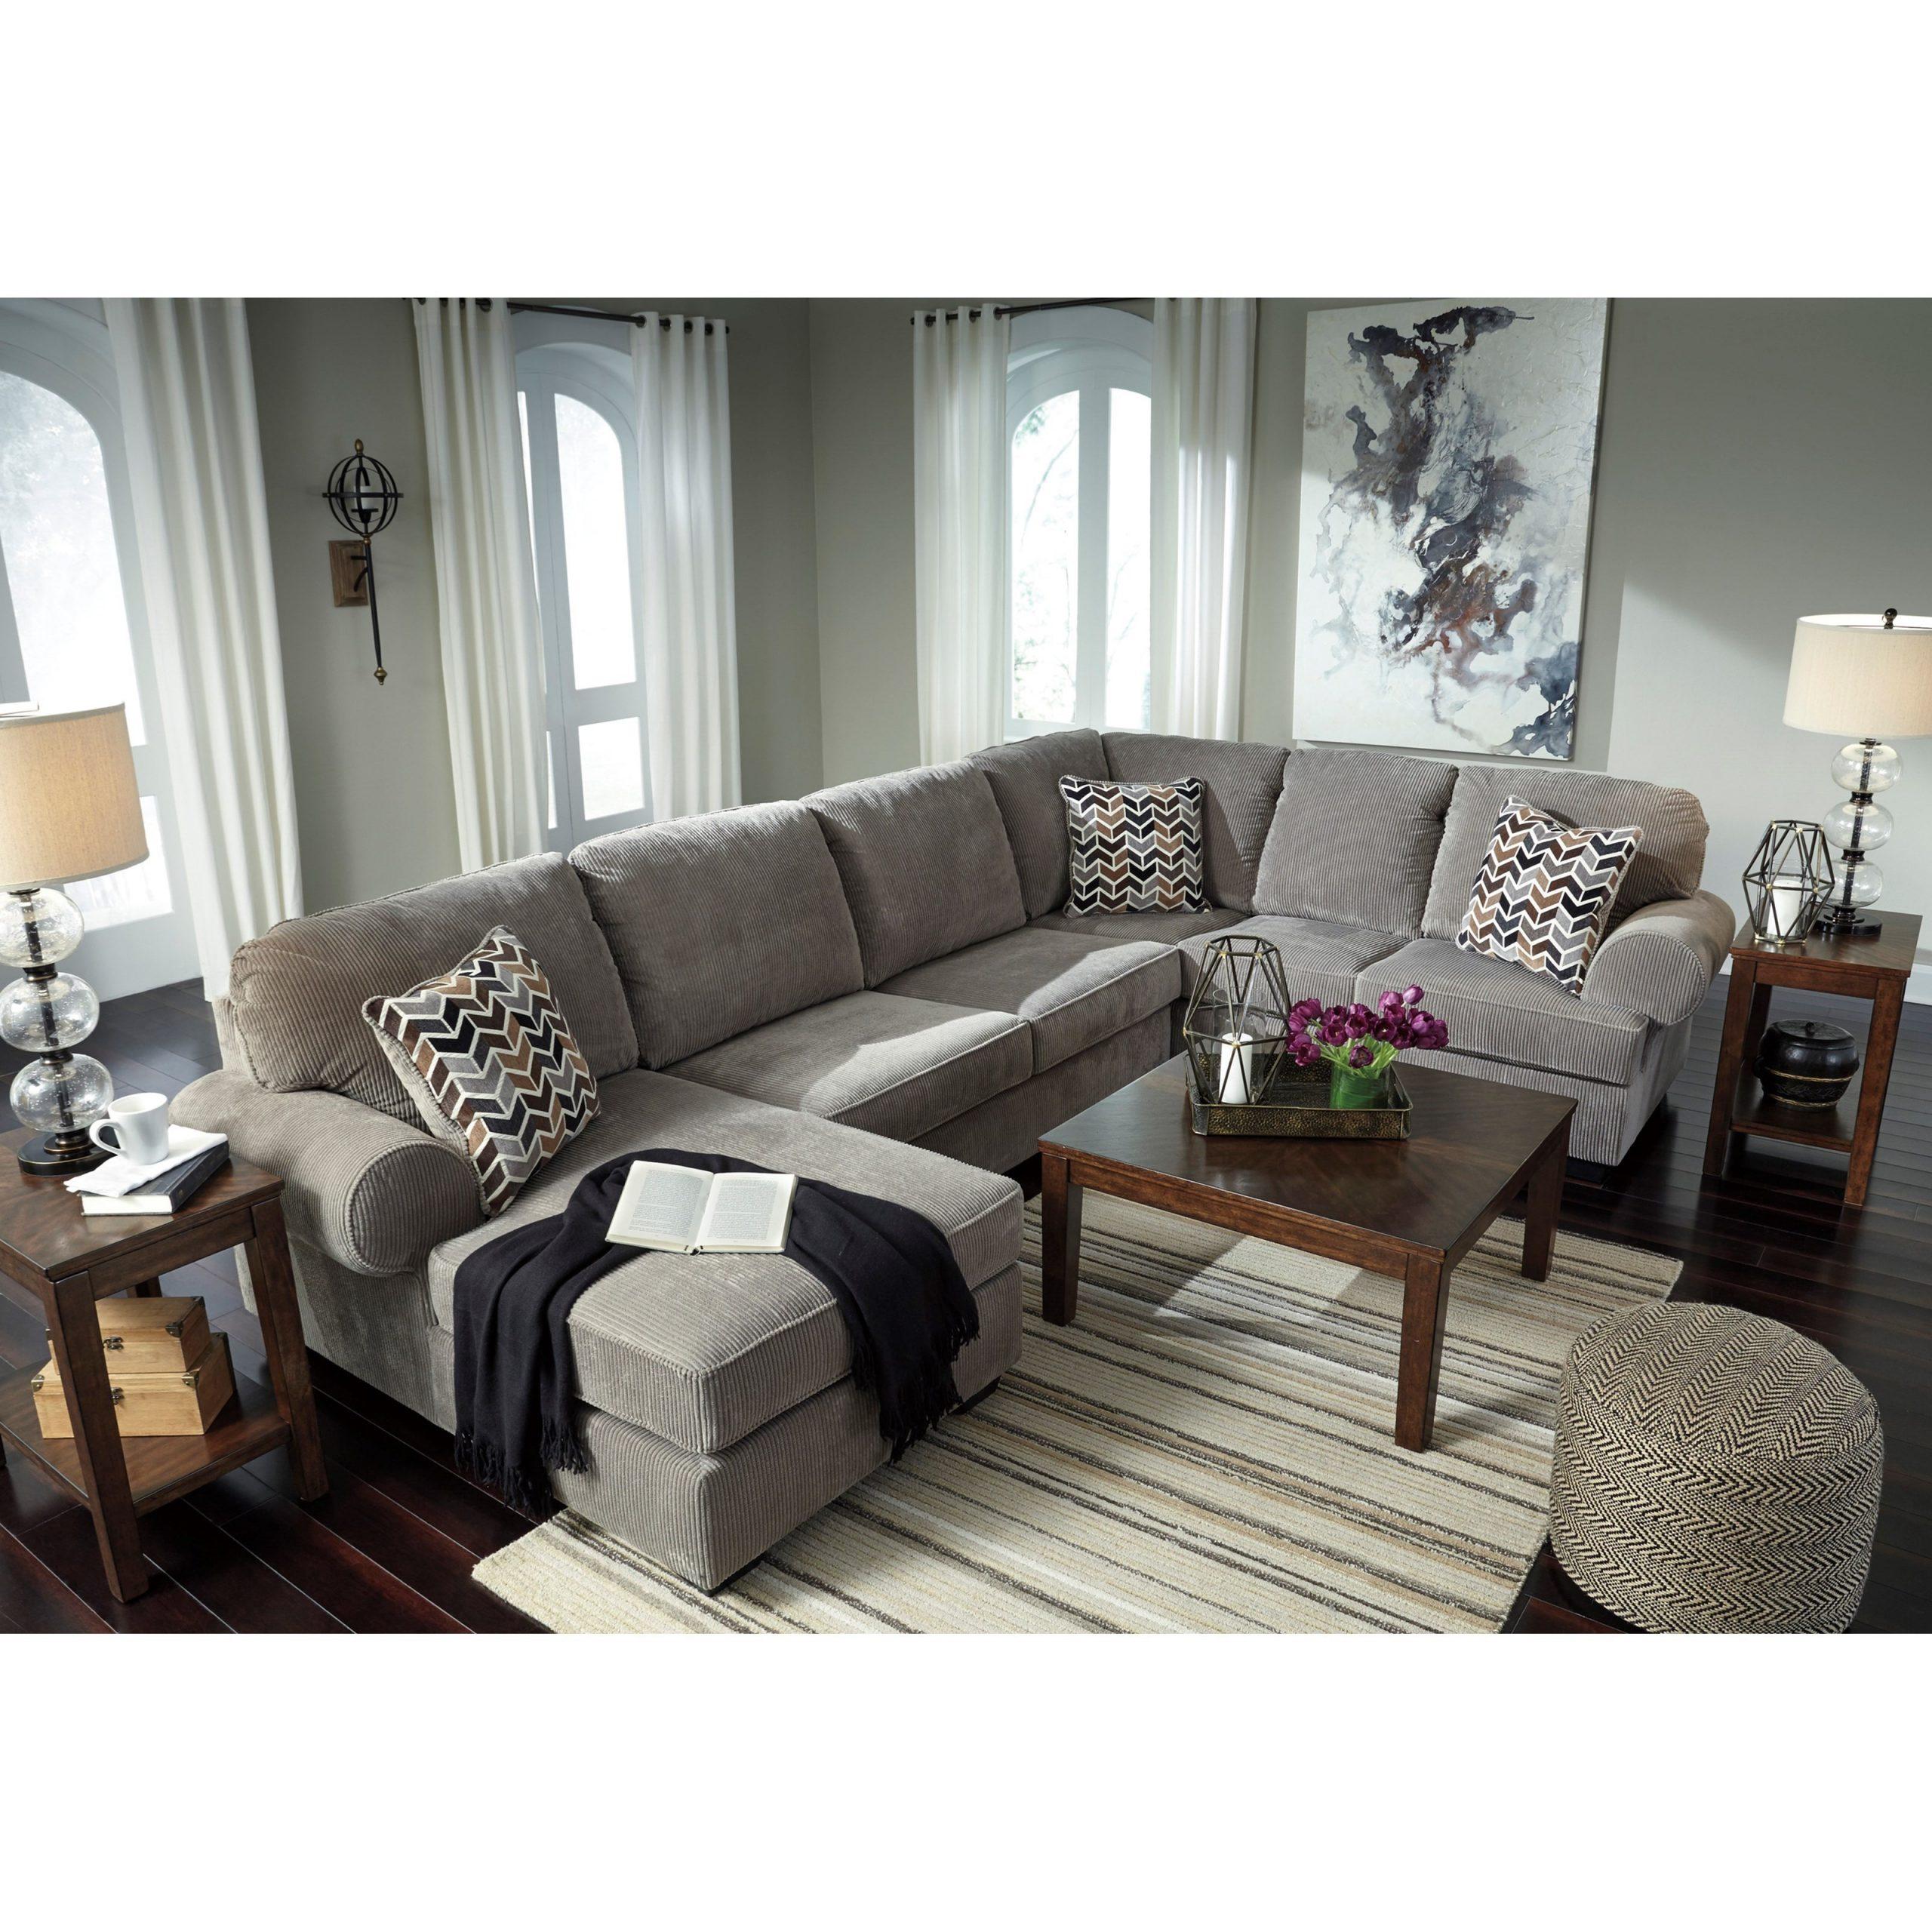 Signature Designashley Jinllingsly Contemporary 3 Regarding Fashionable 3pc Polyfiber Sectional Sofas (View 4 of 20)